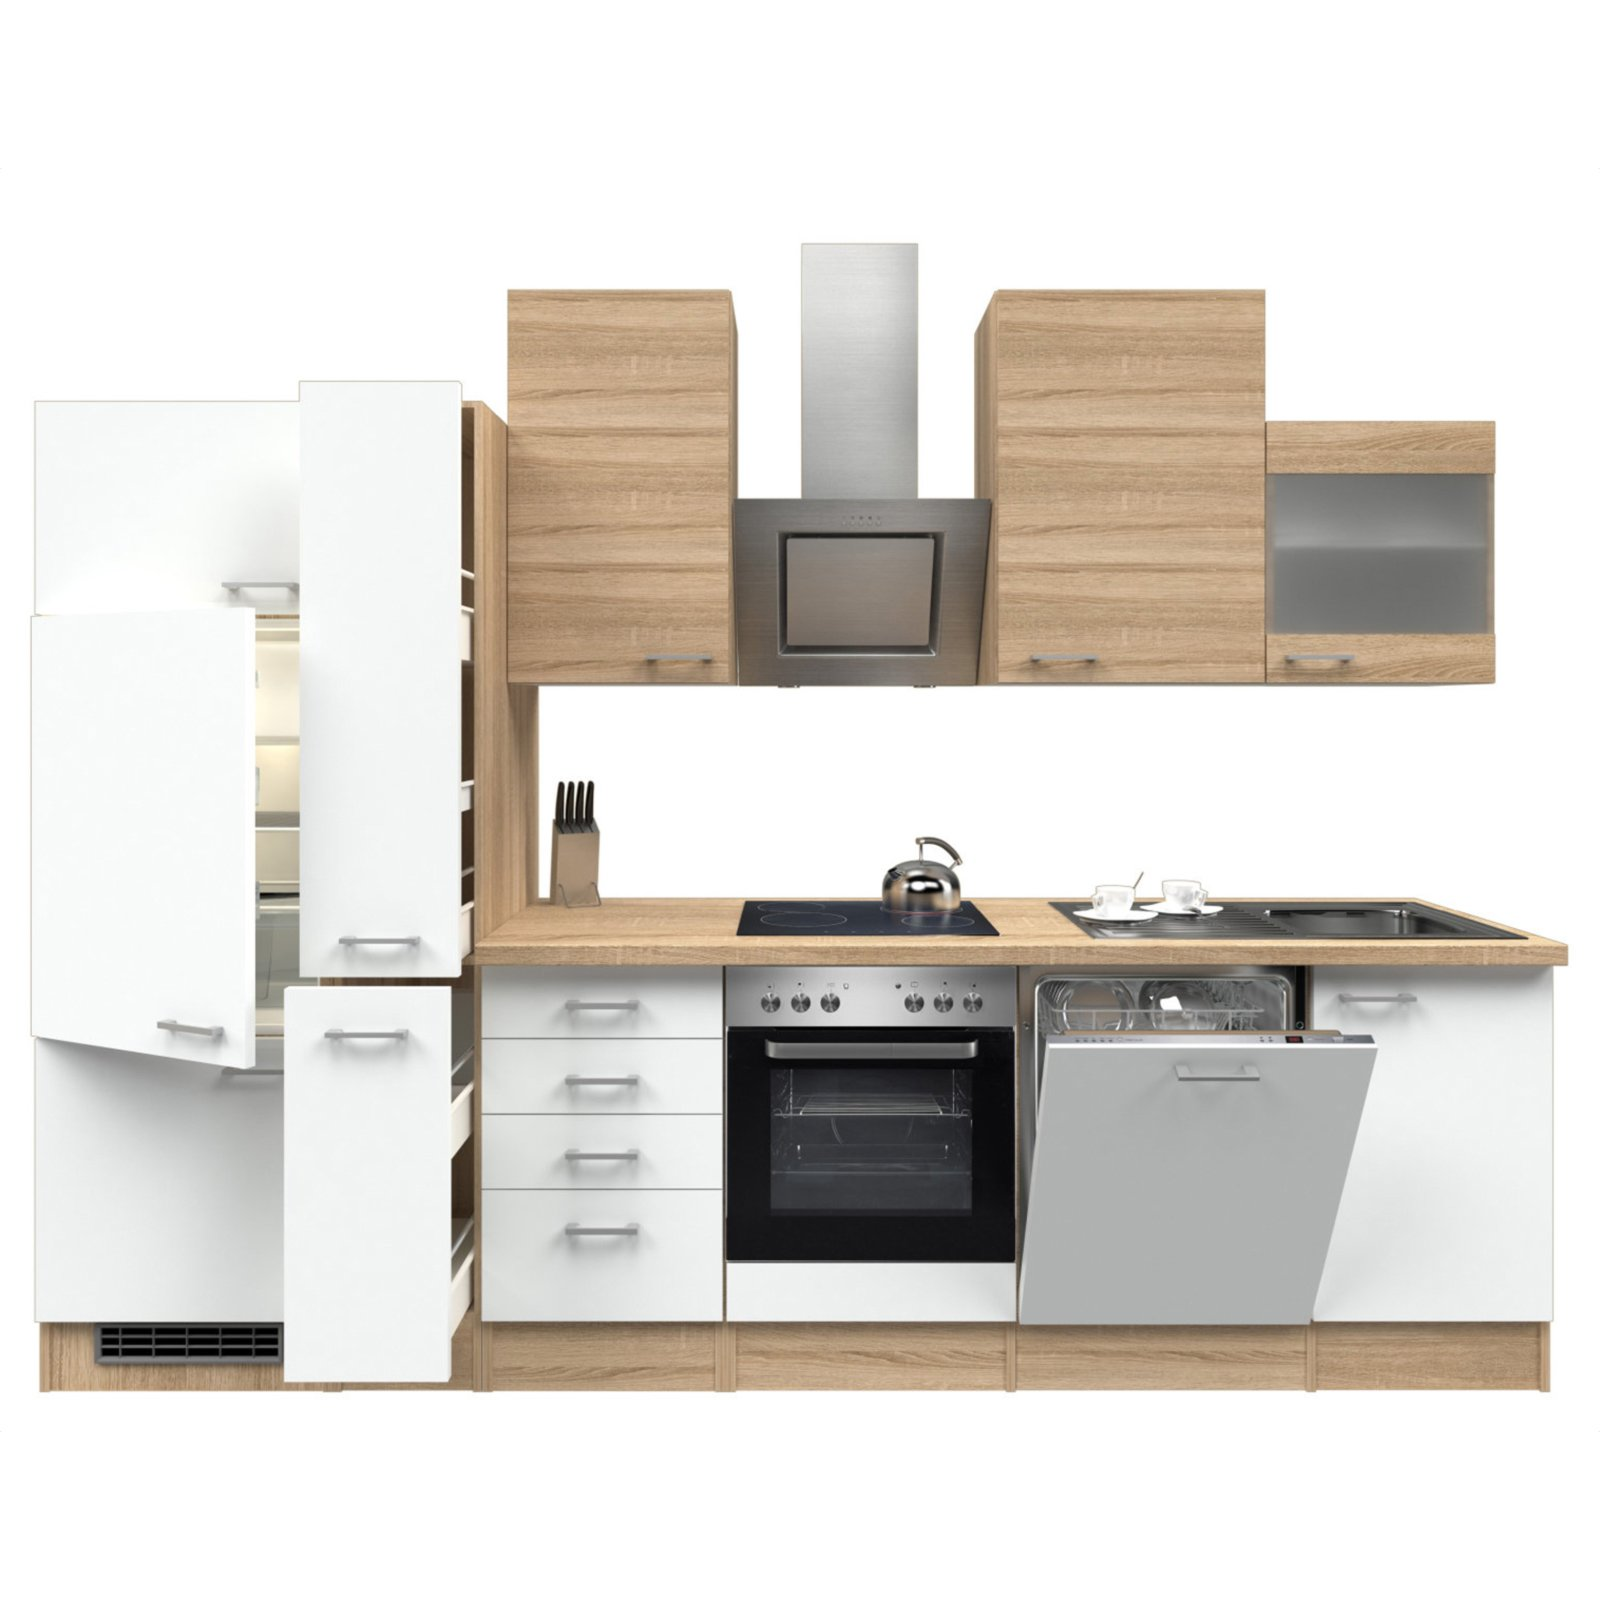 k chenblock samoa wei sonoma eiche mit e ger ten. Black Bedroom Furniture Sets. Home Design Ideas